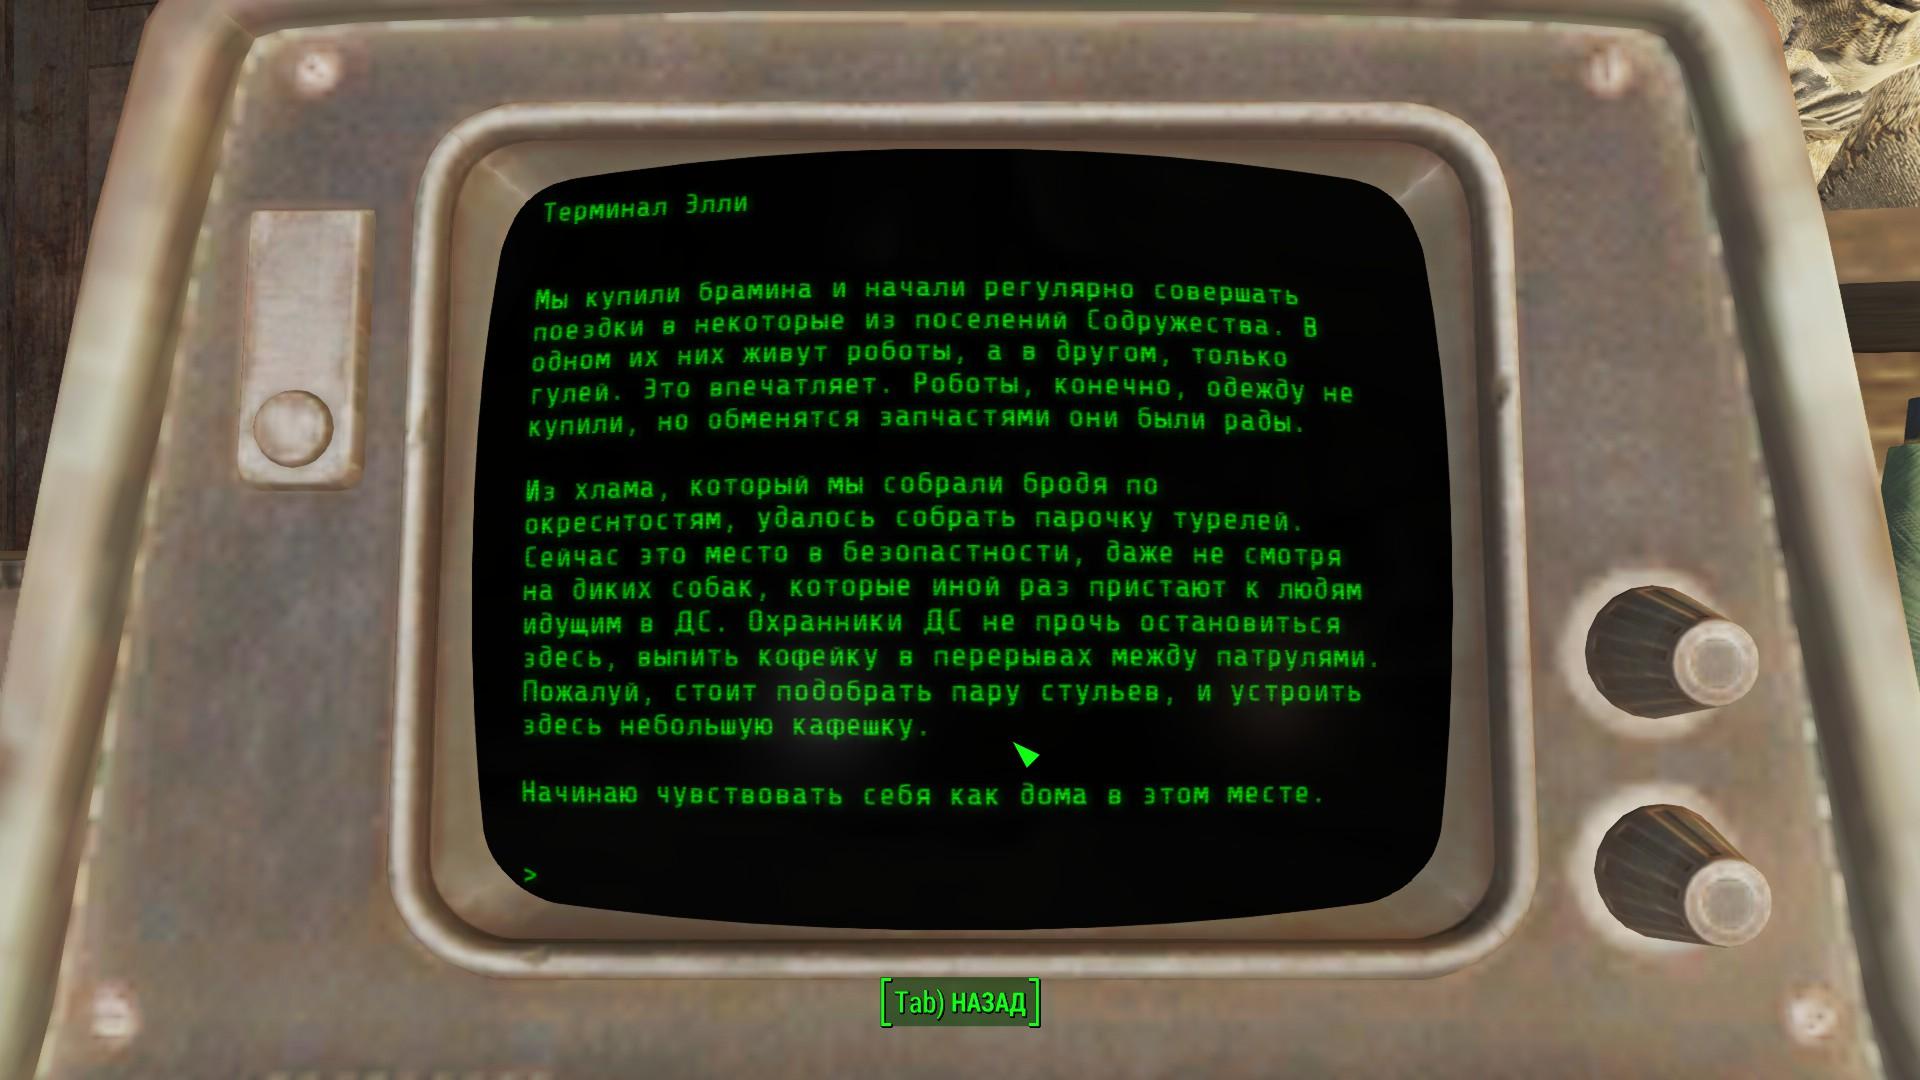 20170930115658_1.jpg - Fallout 4